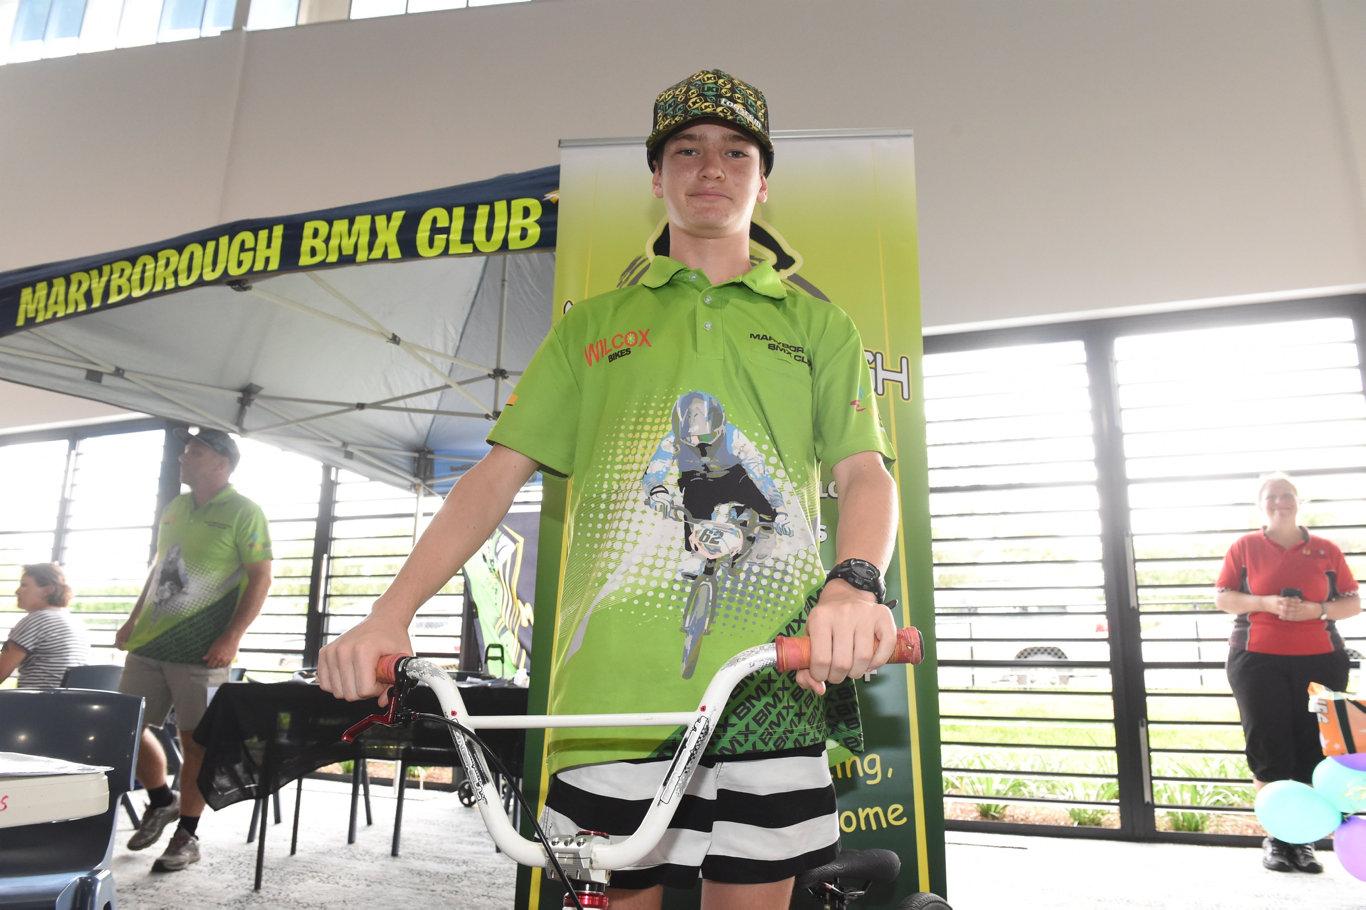 Maryborough all sports showcase - 12yo Kobi Bastable from Maryborough BMX Club.